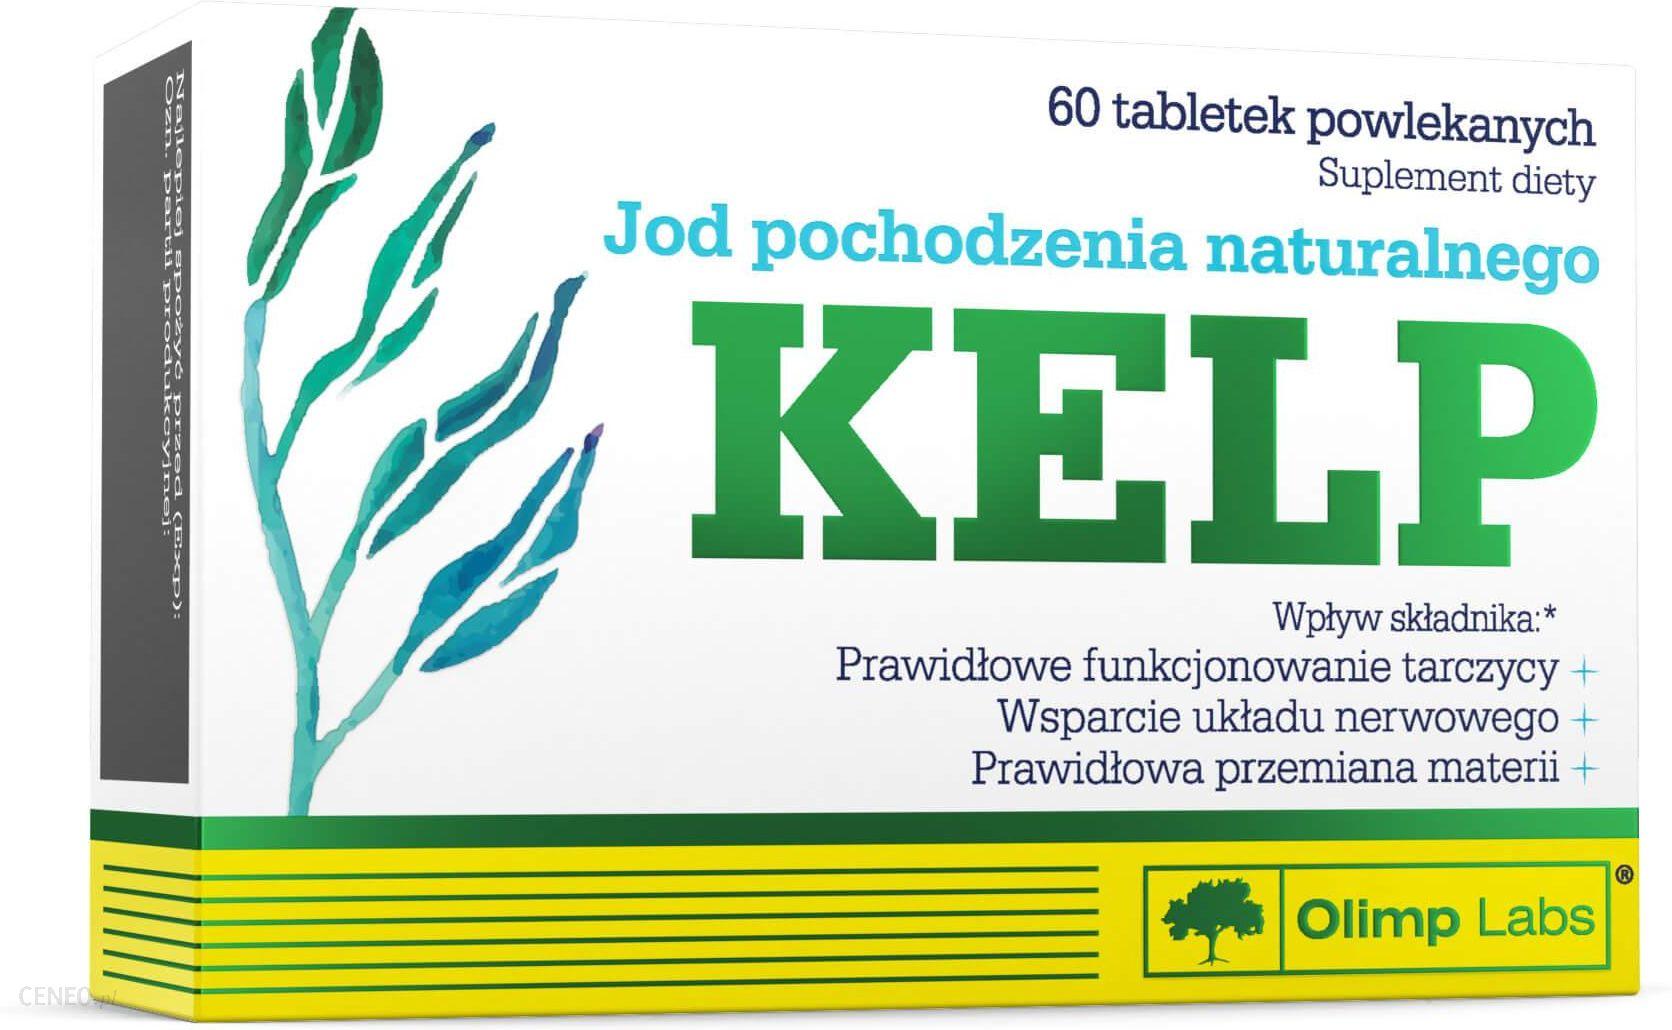 e0ddeea49d43 Suplement diety Olimp Kelp 60 tabl. - Opinie i ceny na Ceneo.pl